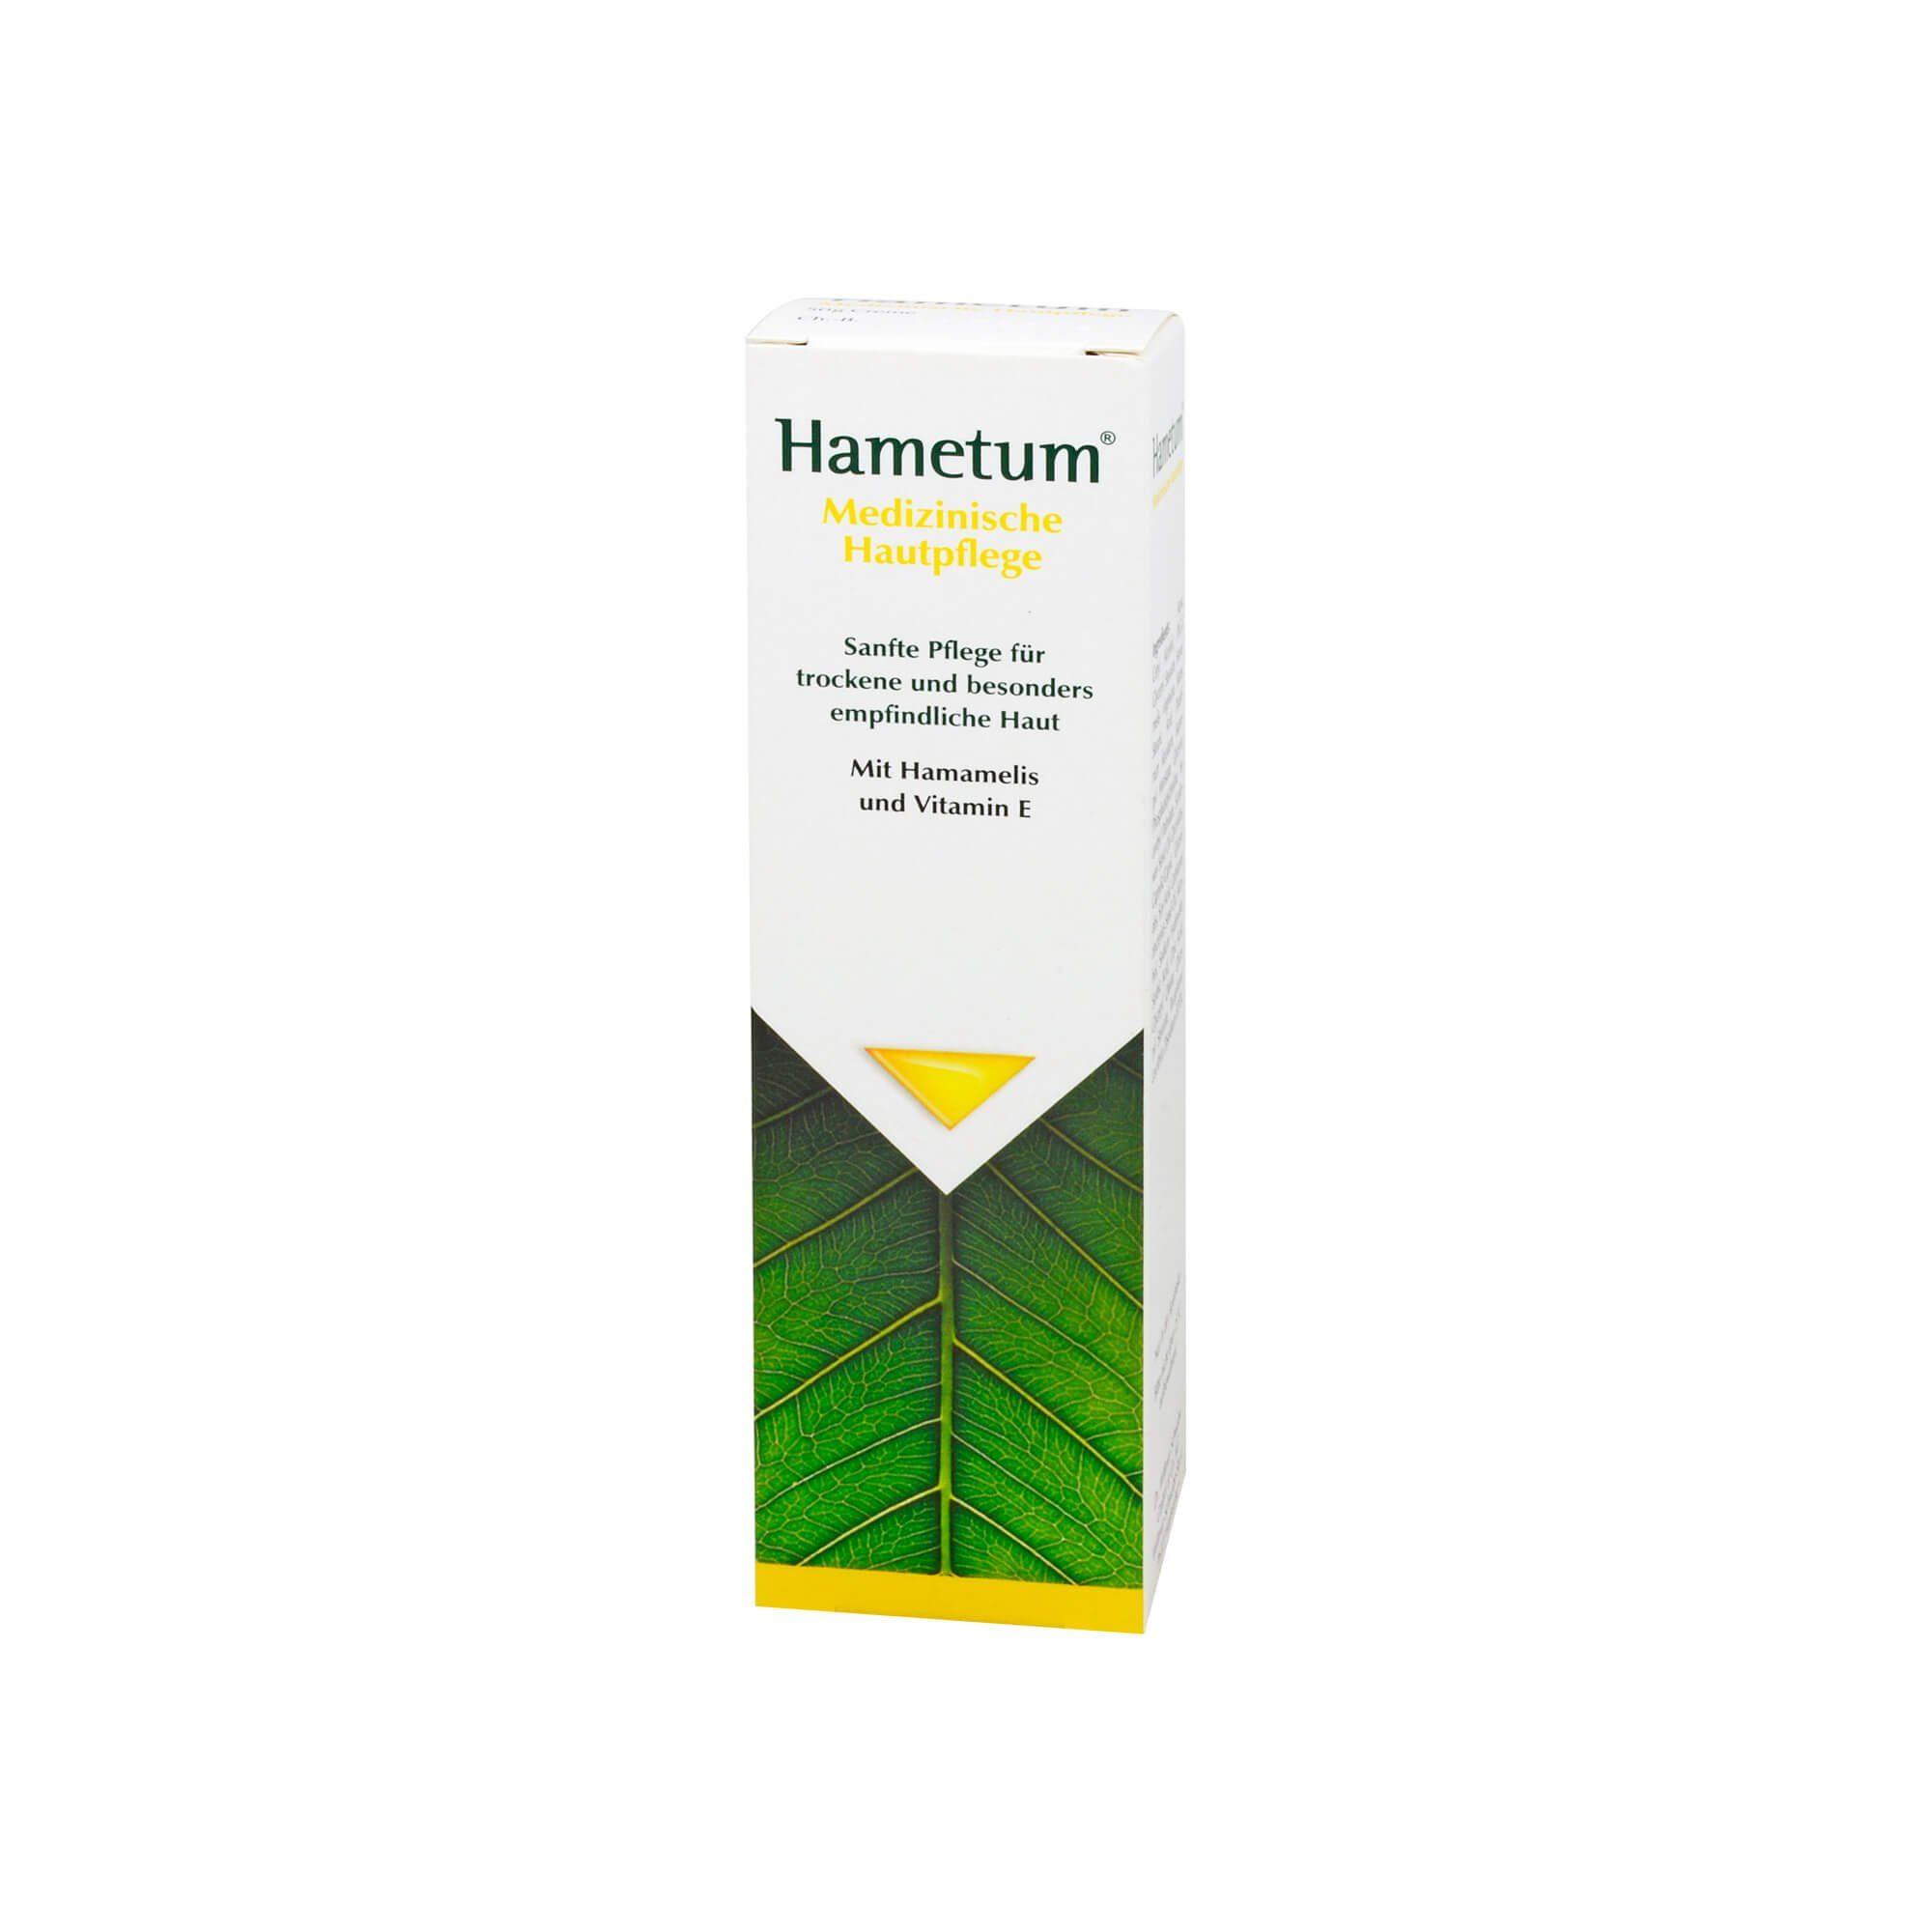 Hametum Medizinische Hautpflege Creme, 50 g